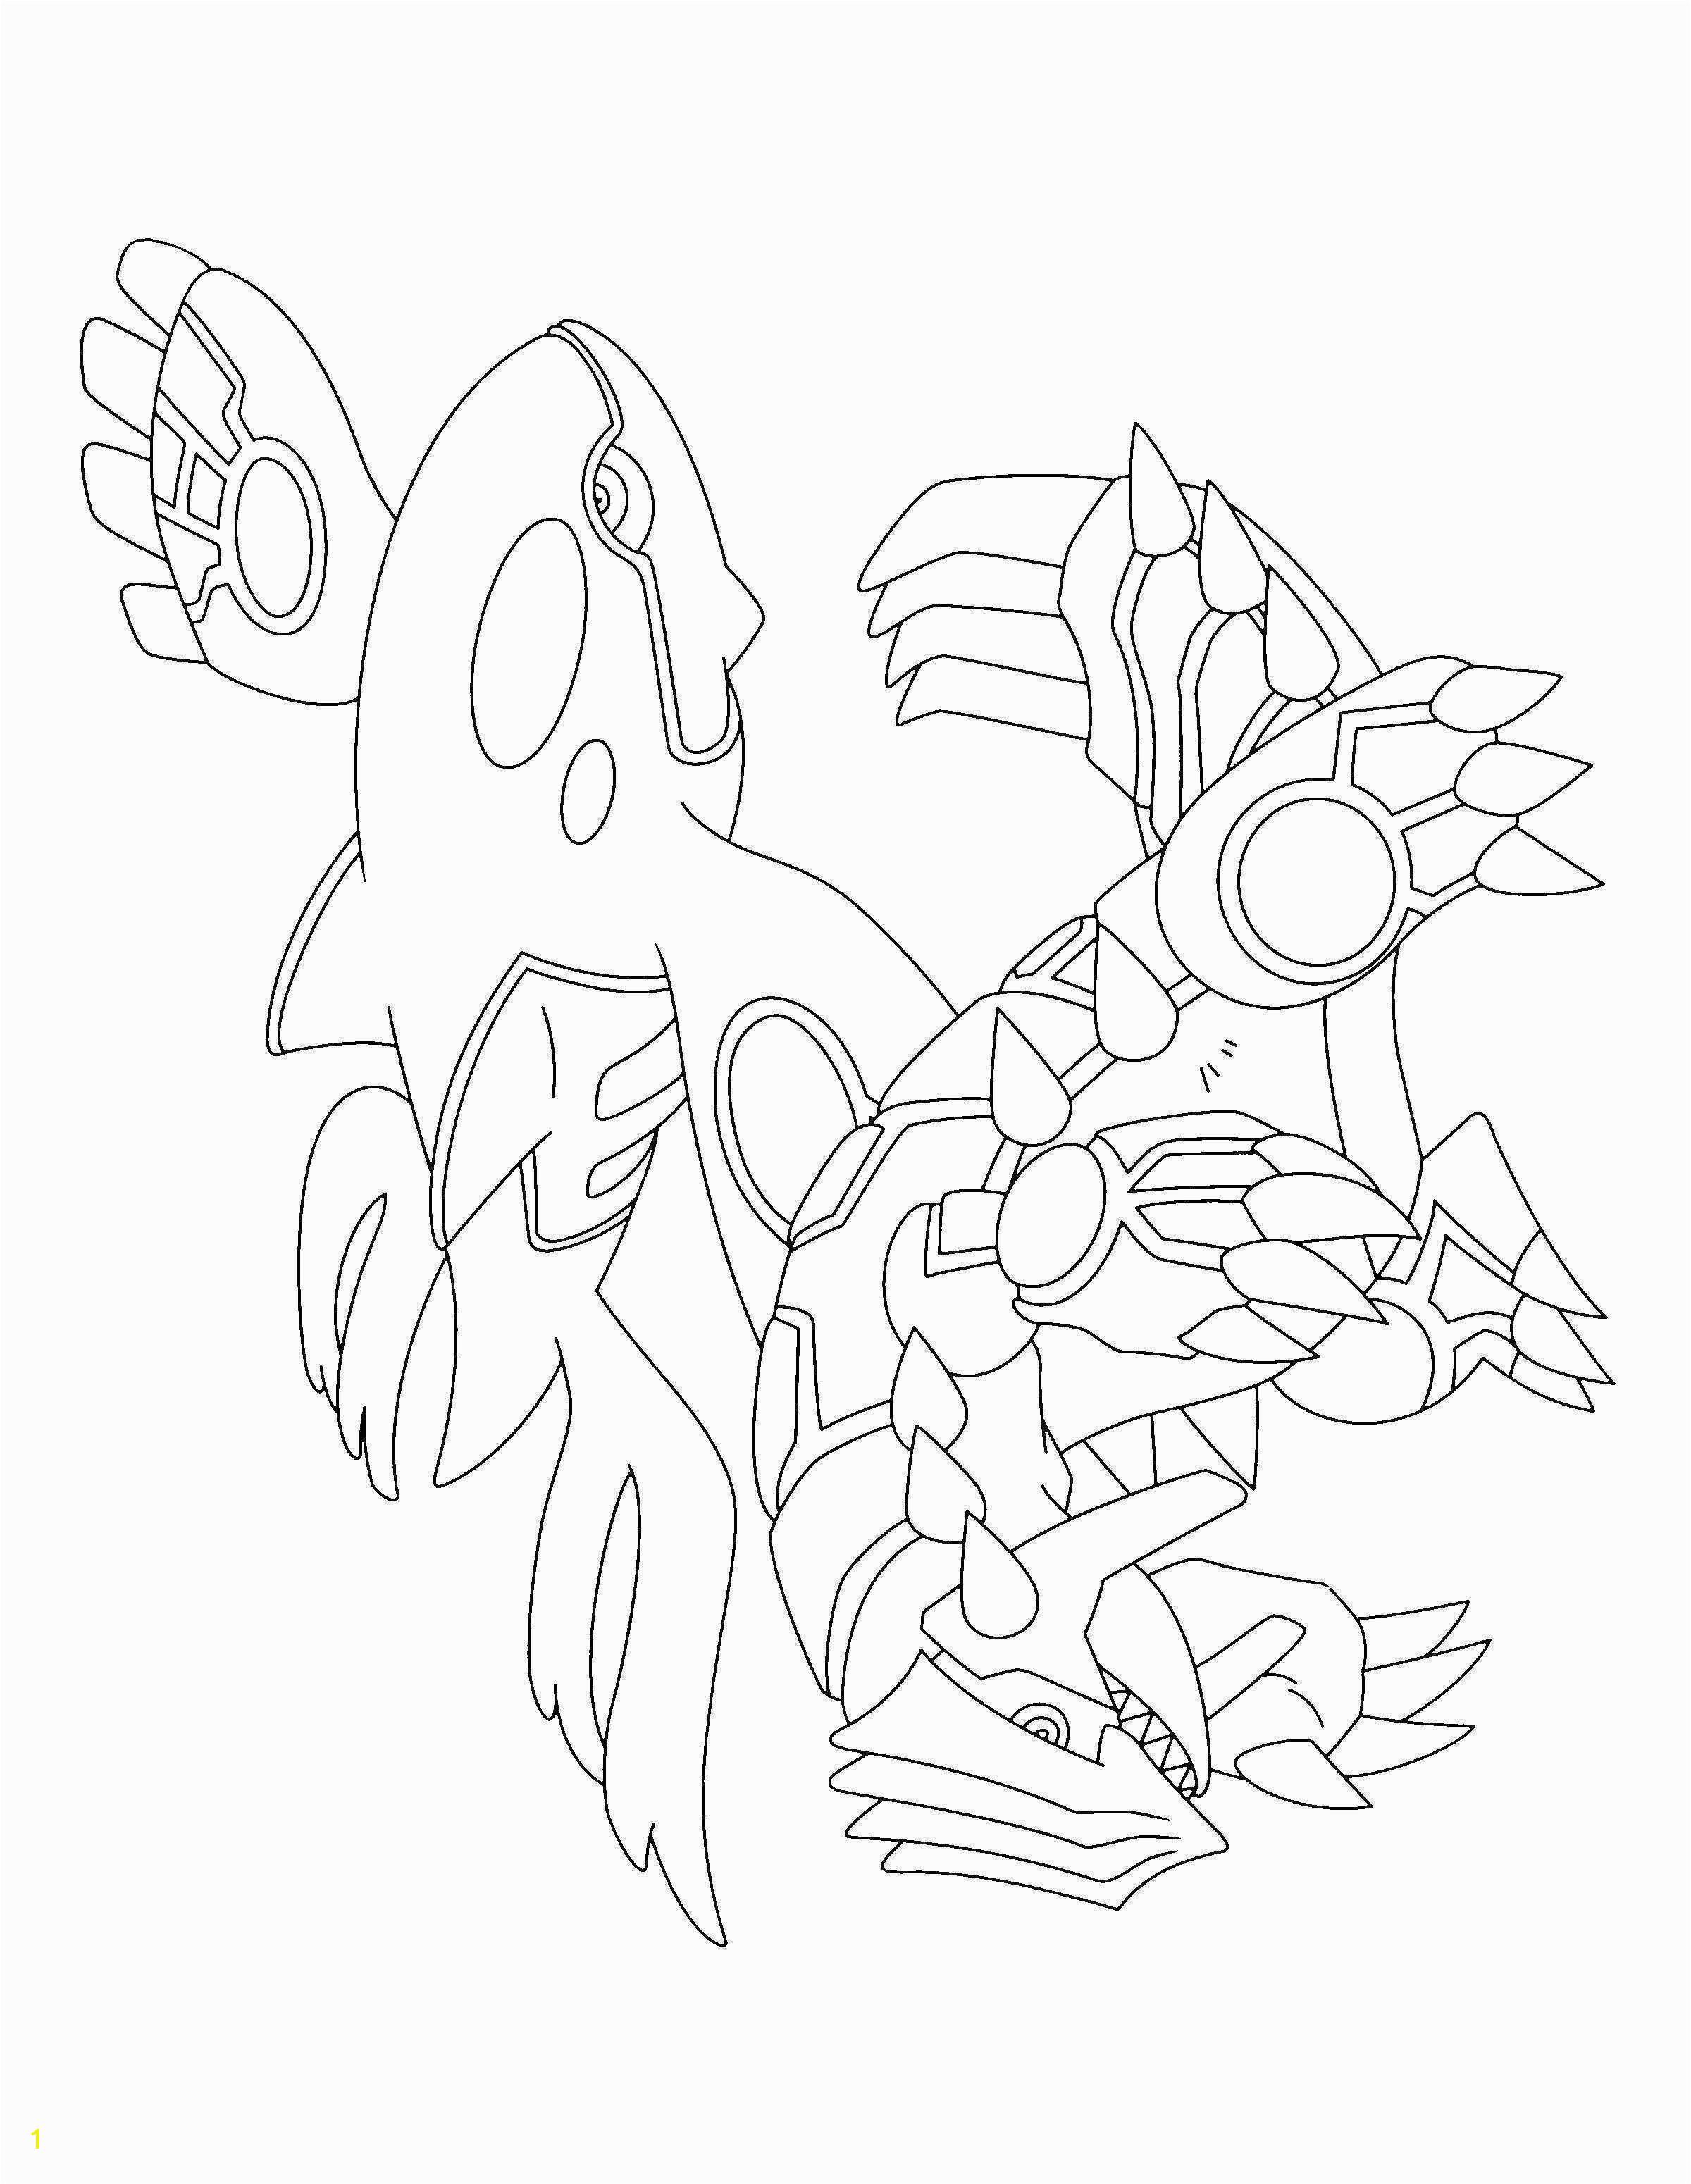 Coloriage Pokemon Groudon Awesome Kyogre Coloring Pages Mega Printable Legendary Colouring Pokemon